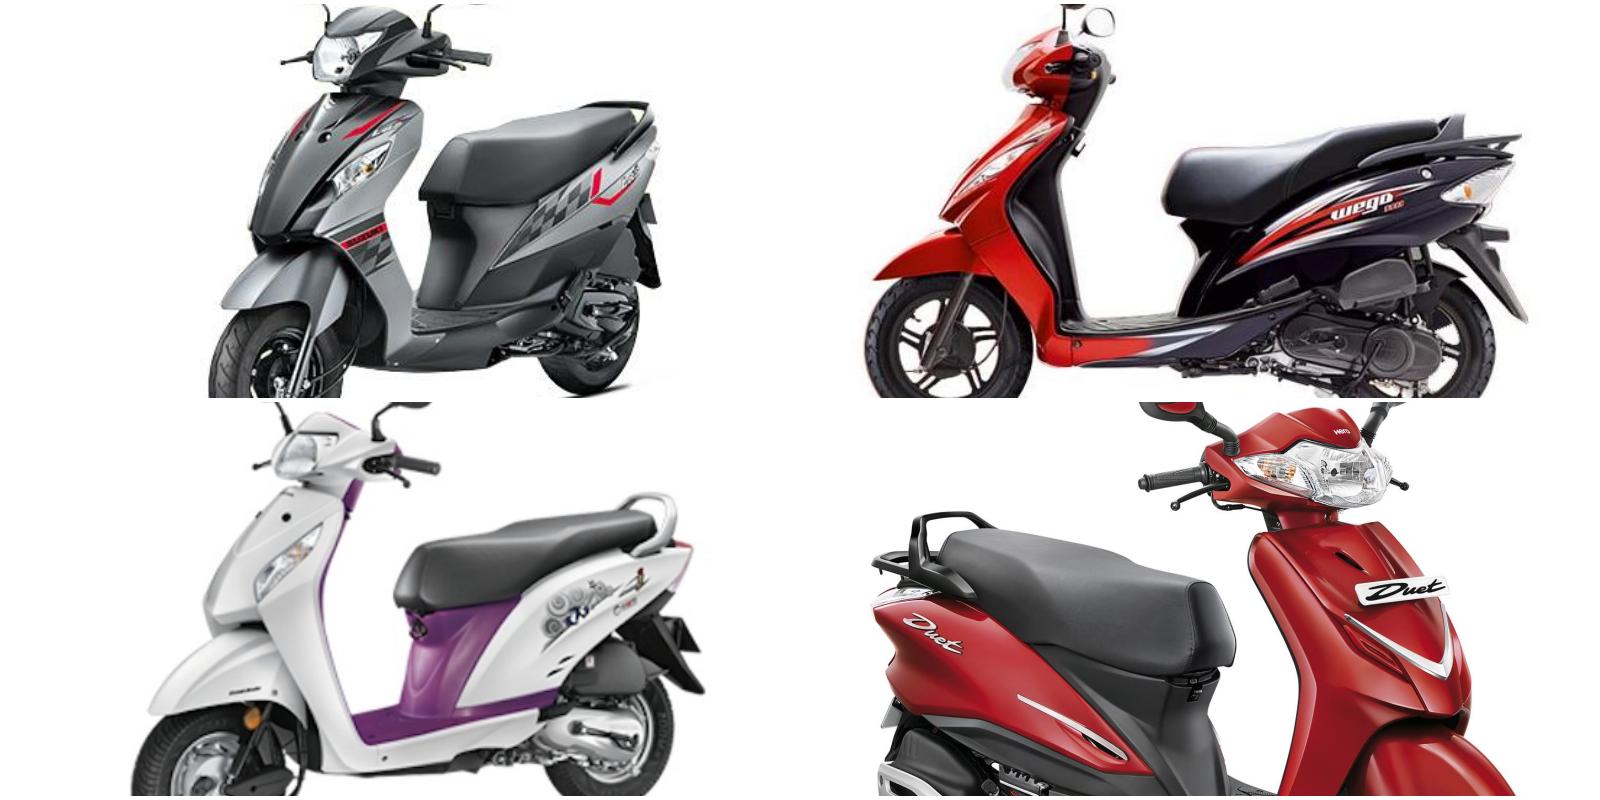 Honda Activa I Vs Hero MotoCorp Duet TVS Wego Suzuki Lets